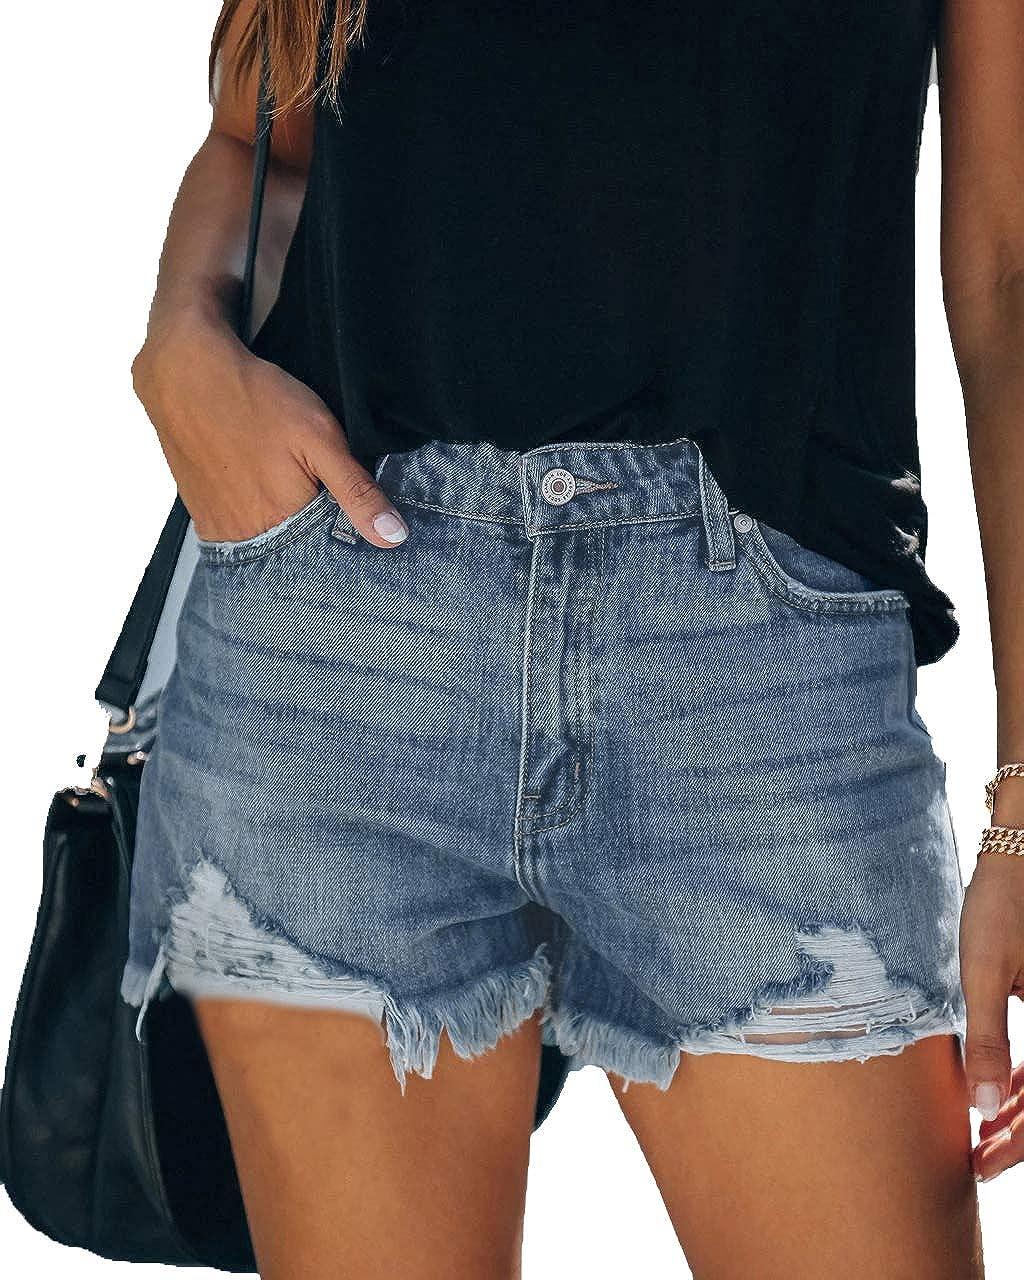 Seyorz Denim Fresno Mall Hot Shorts for Women Rise High Stretch Mid Shaping Purchase